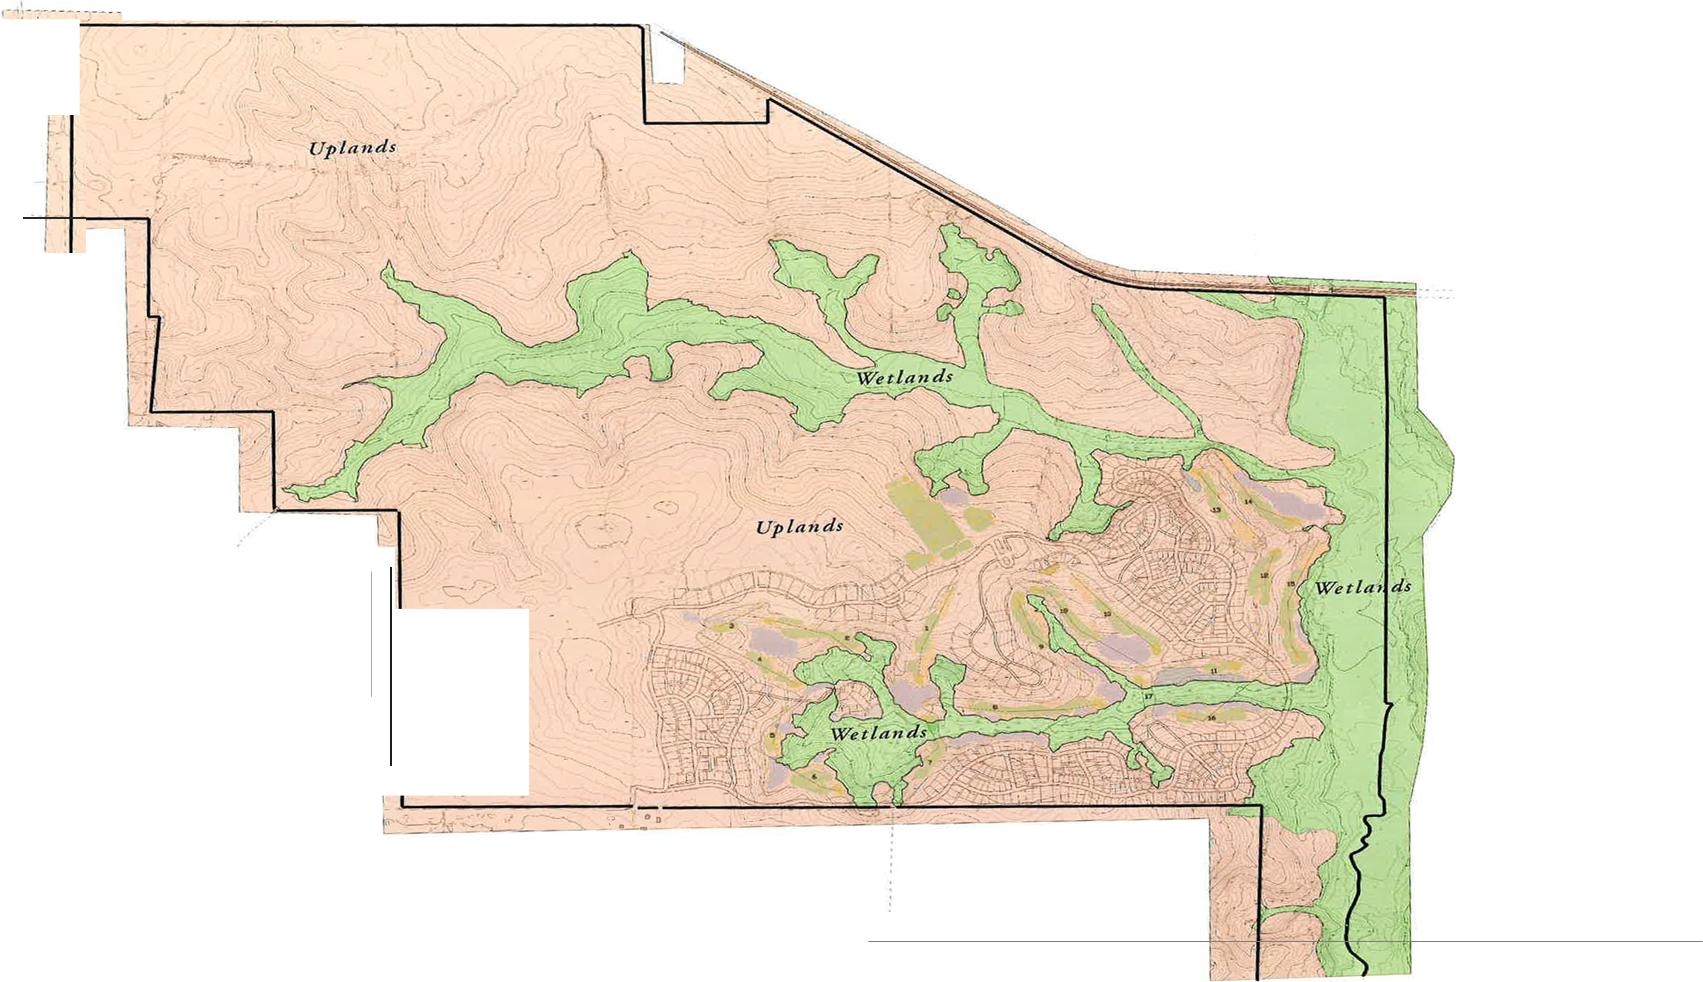 Home - Florida uplands map